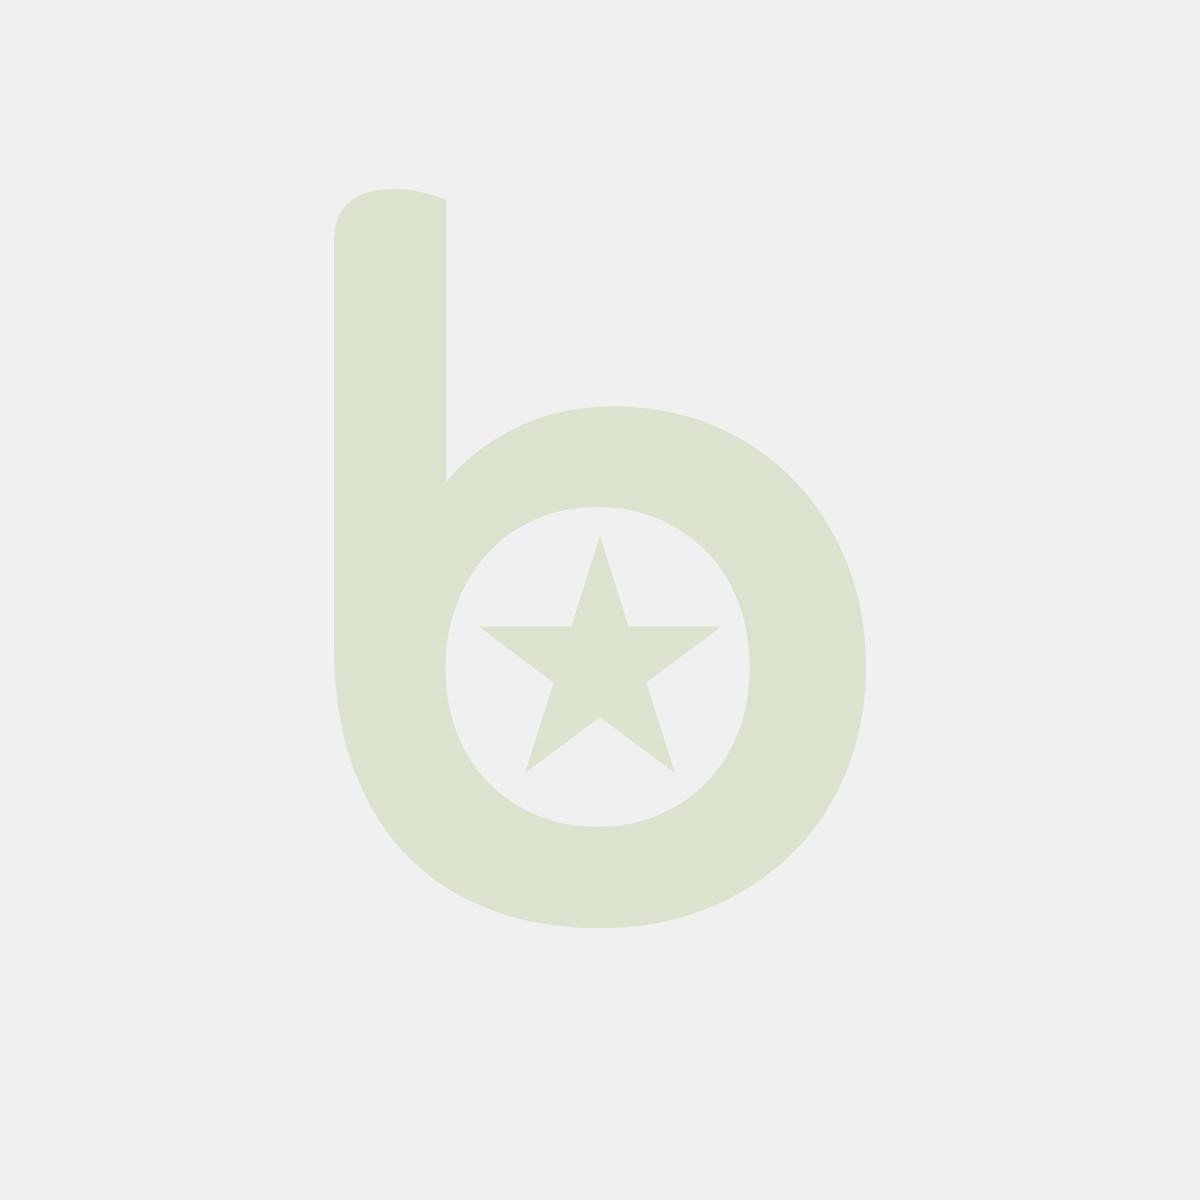 FINGERFOOD - kubek PS GIUNONE 320ml transparentny op. 50 sztuk